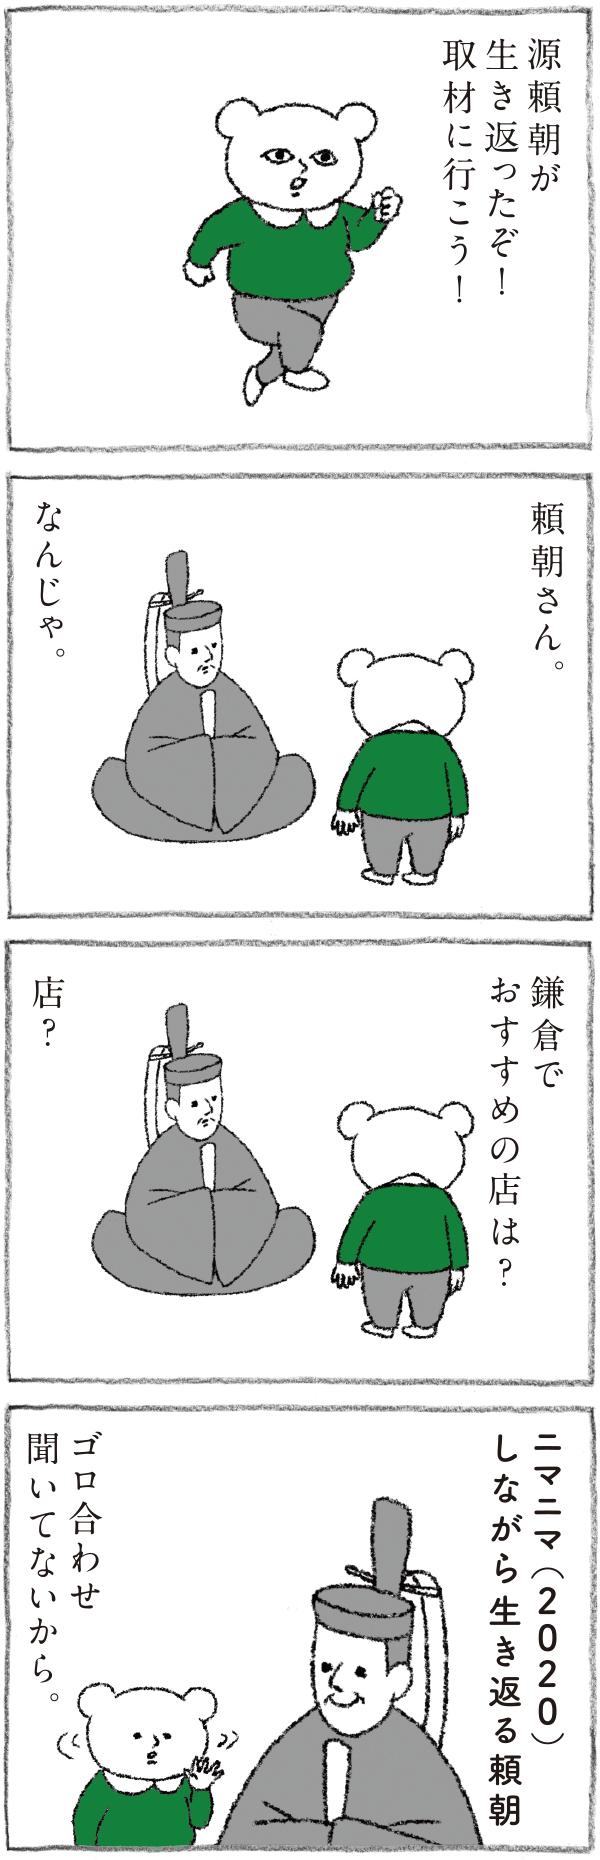 Hanako 1184号:おかわり自由